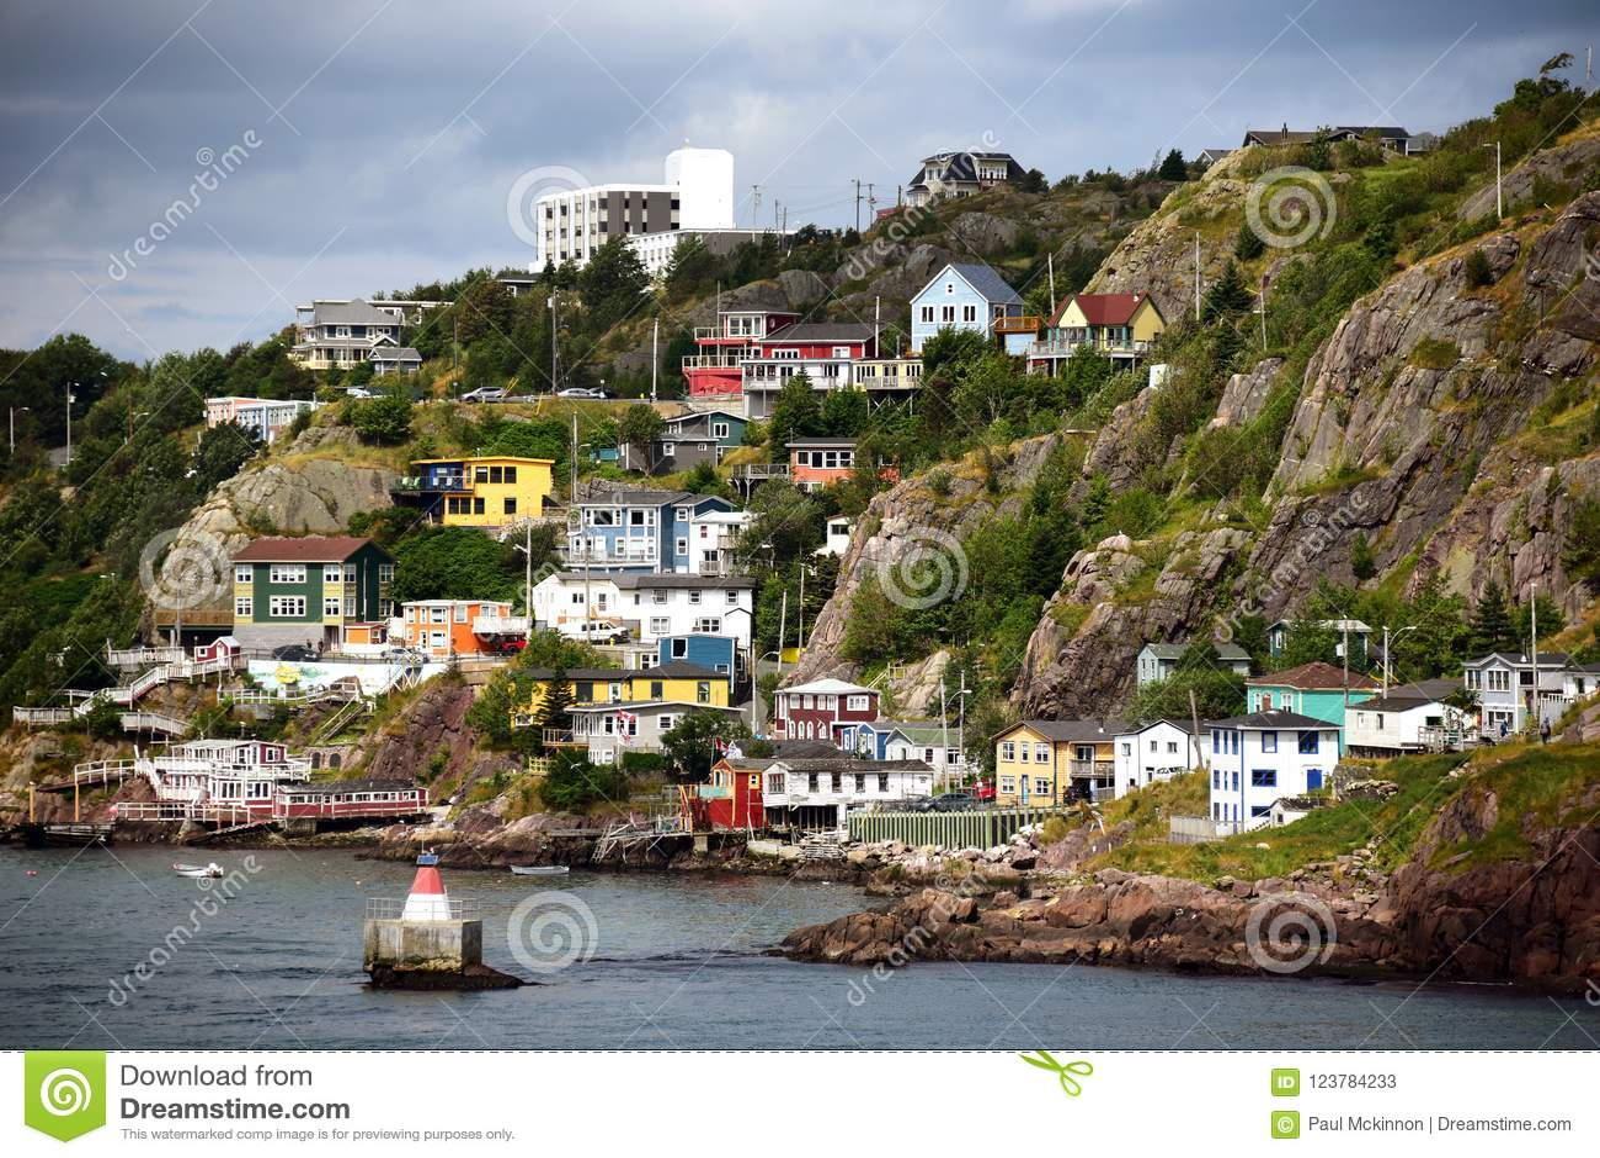 The Battery neighborhood in St. John's Newfoundland